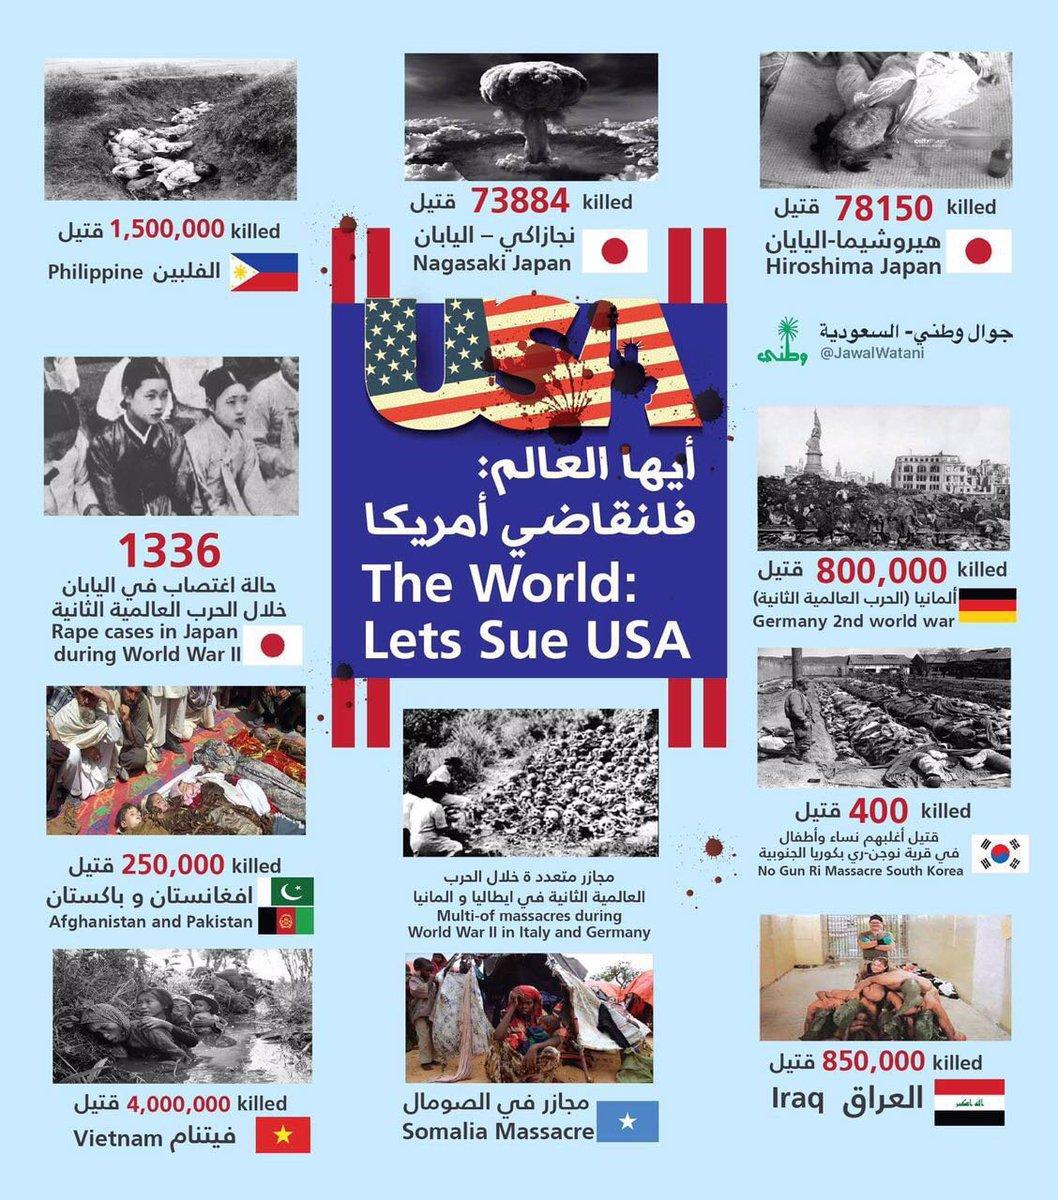 Hello World #let_us_sue_usa جرافيك ذكي جداً أيها العالم #تعالوا_نحاكم_أمريكا #جاستا #JASTA  #saudi #السعودية https://t.co/nfbsr4t1Vb